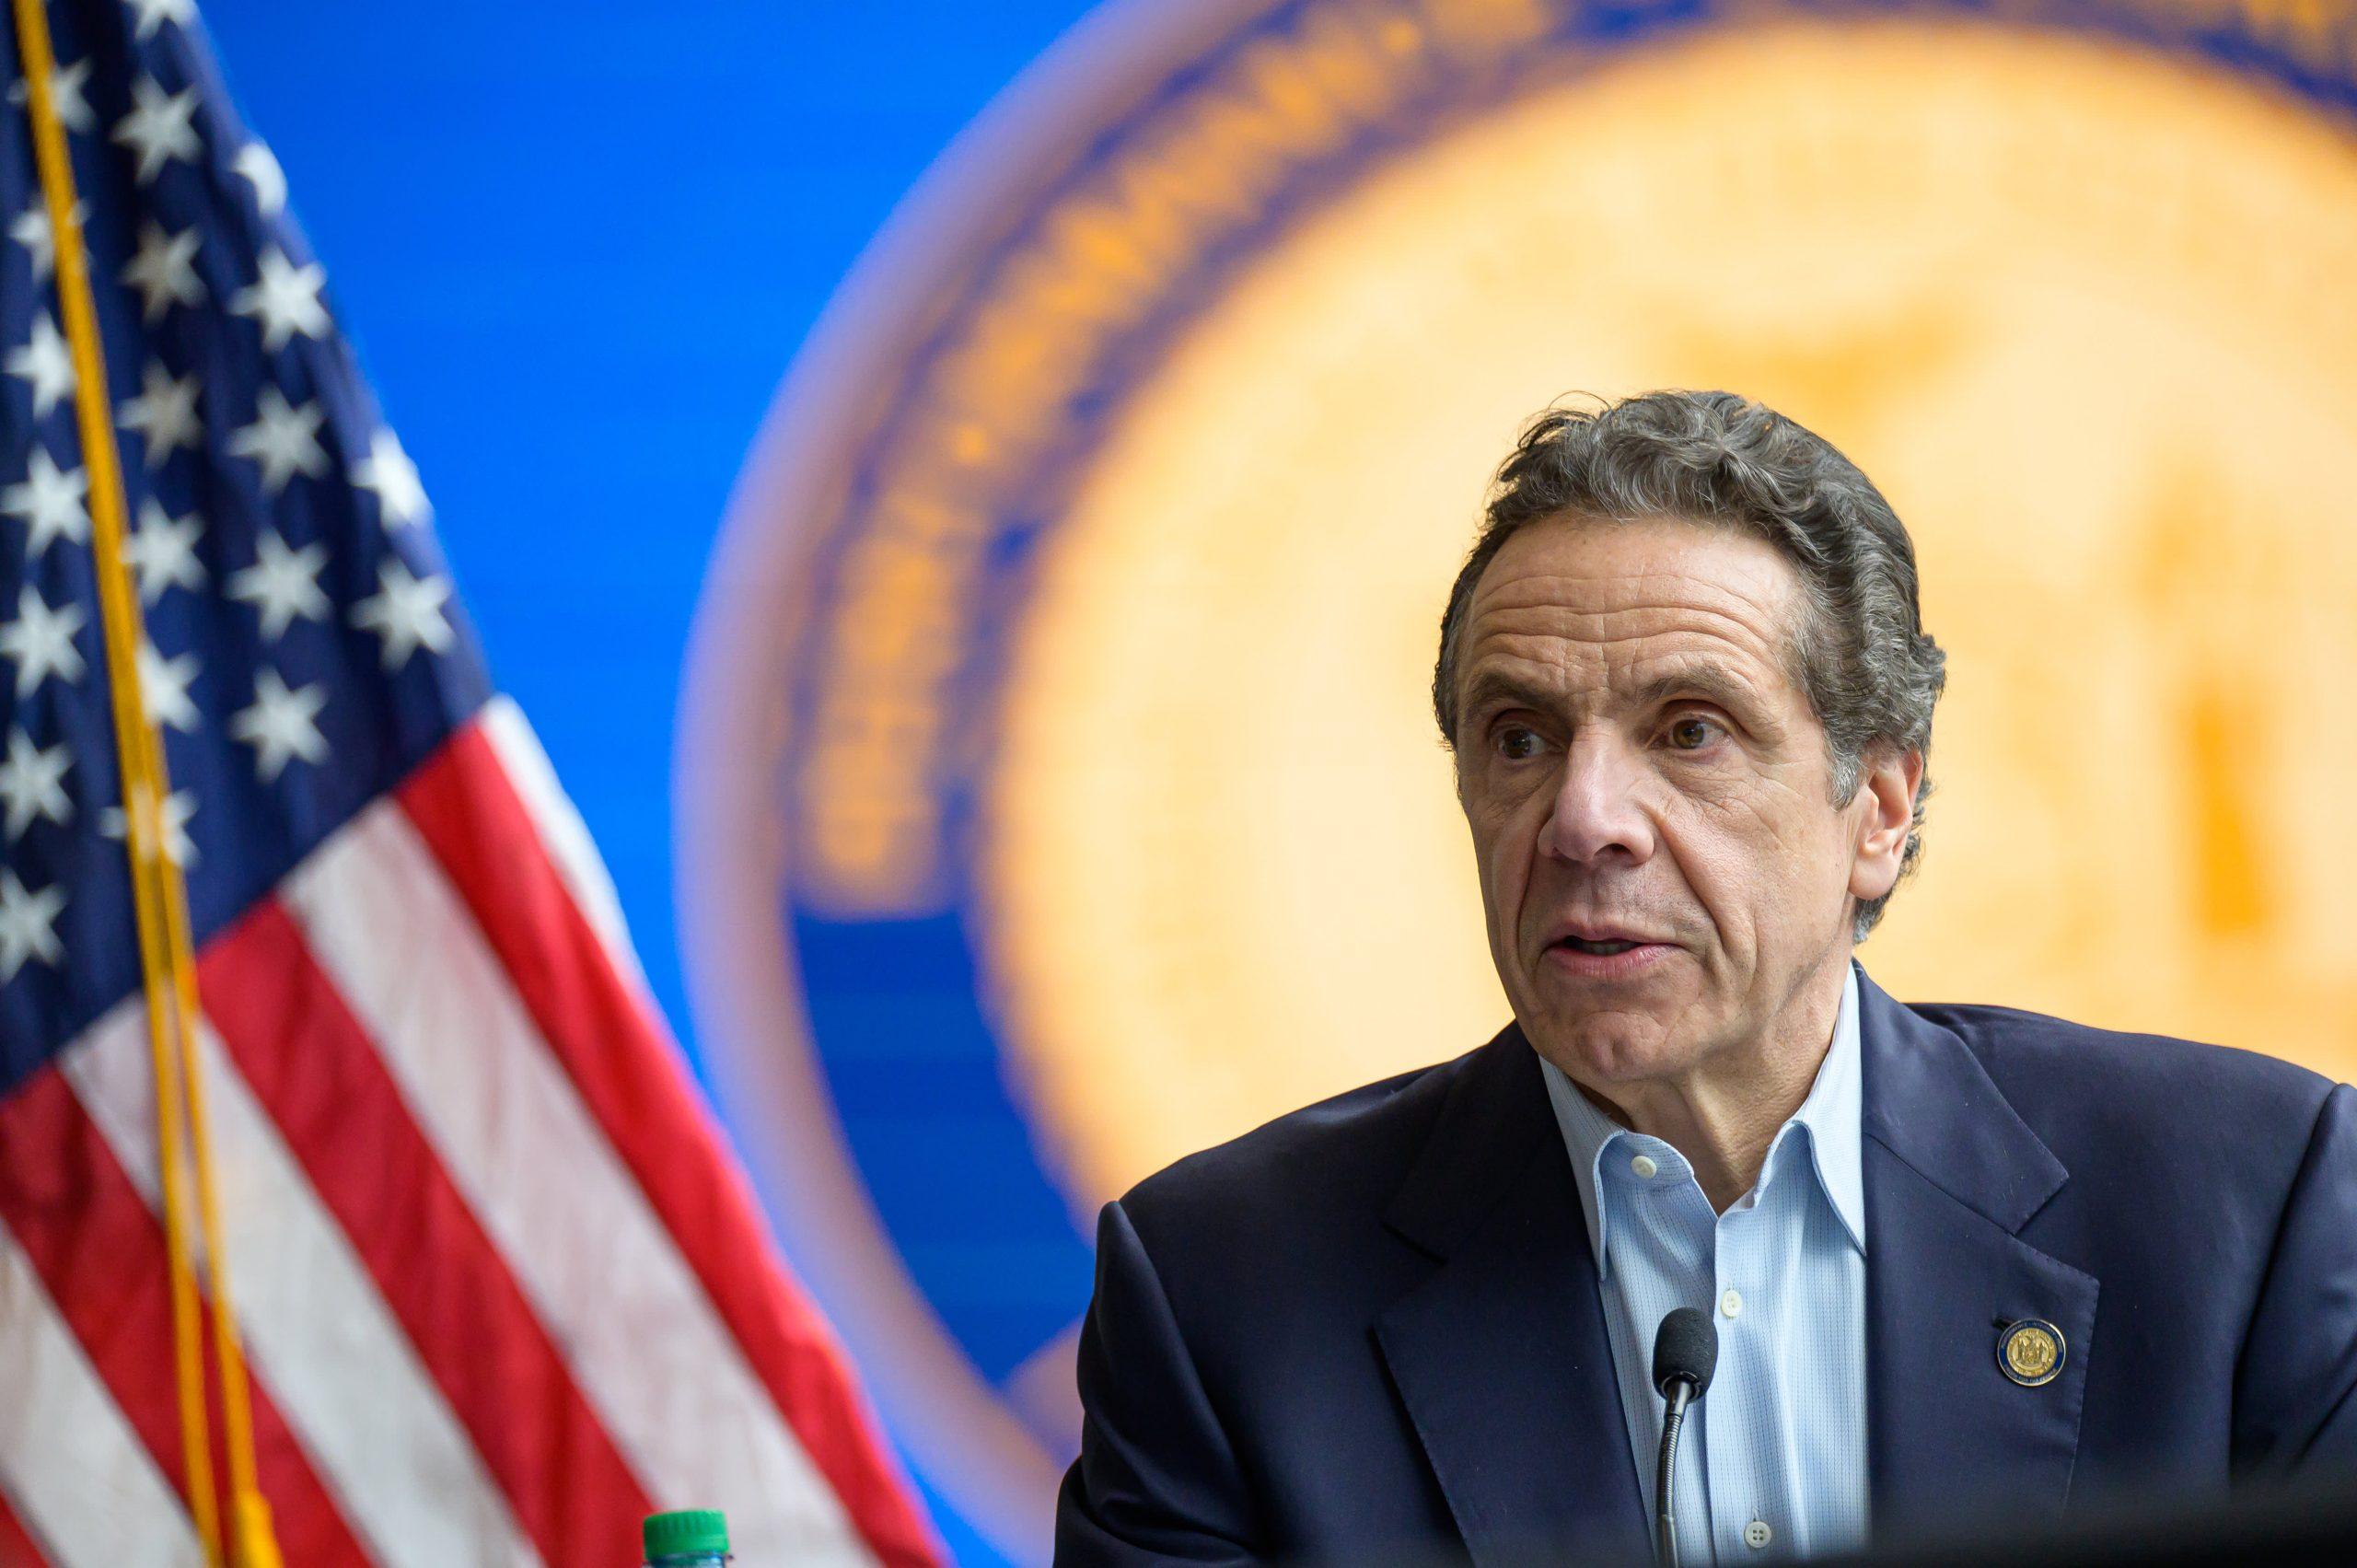 new-york-metropolis-will-shut-indoor-eating-beginning-monday-gov-cuomo-says